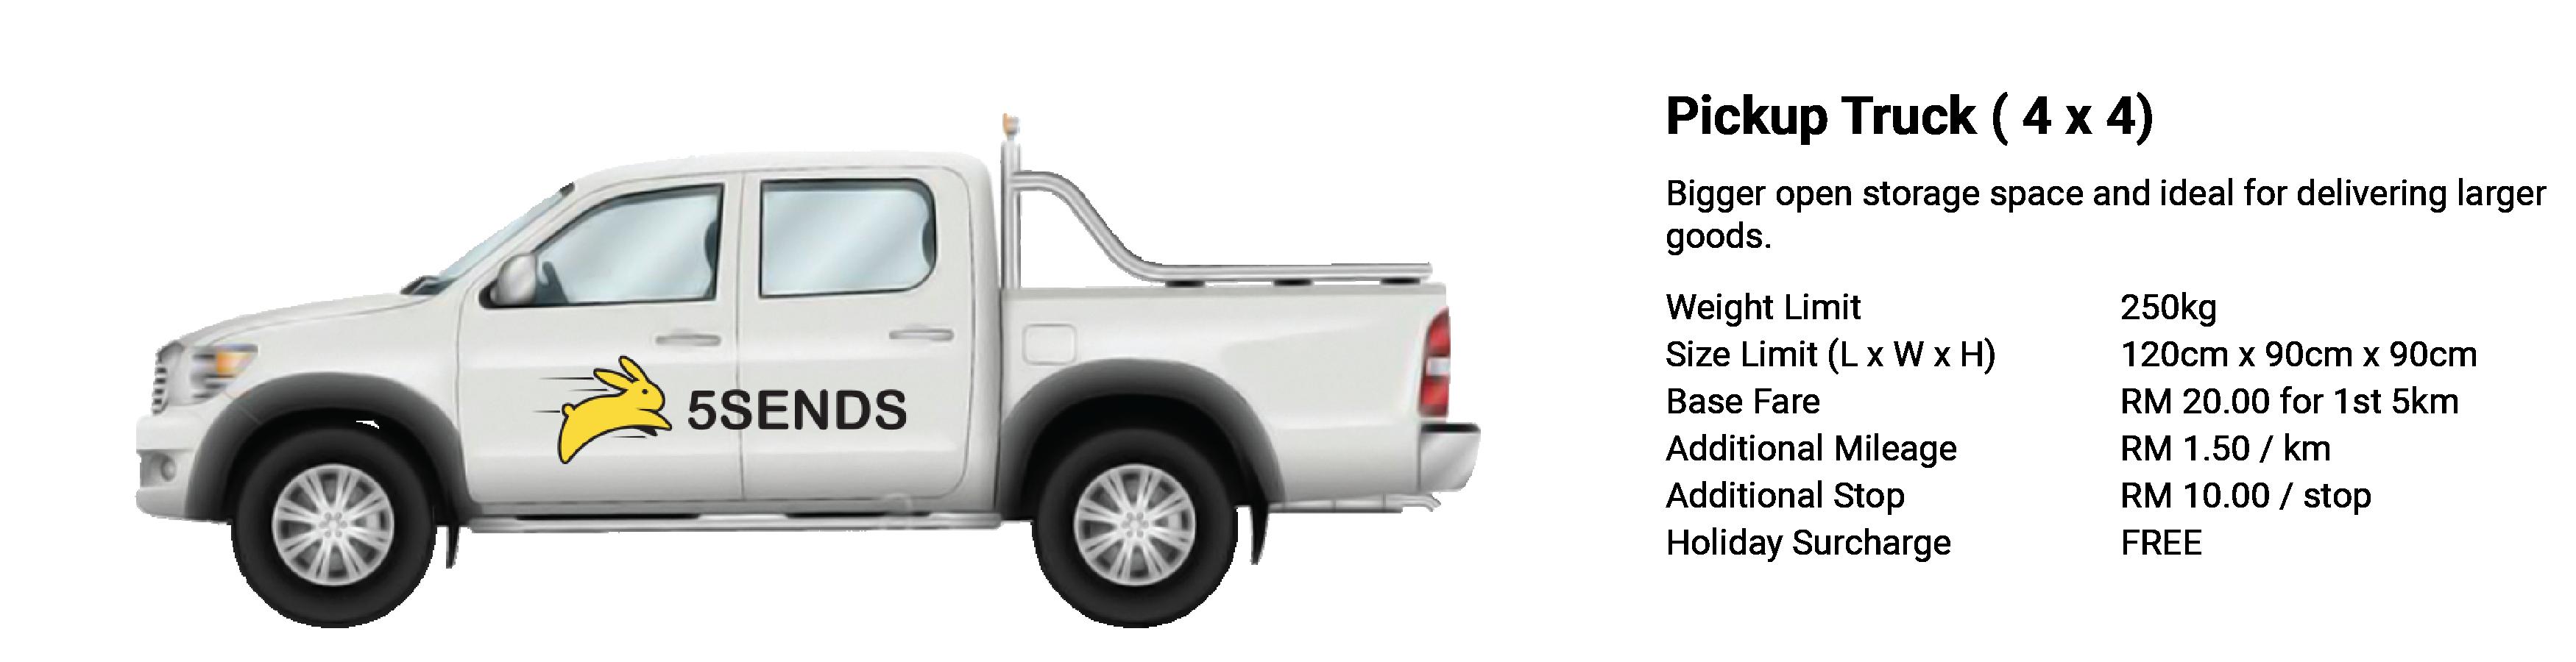 Web_Truck